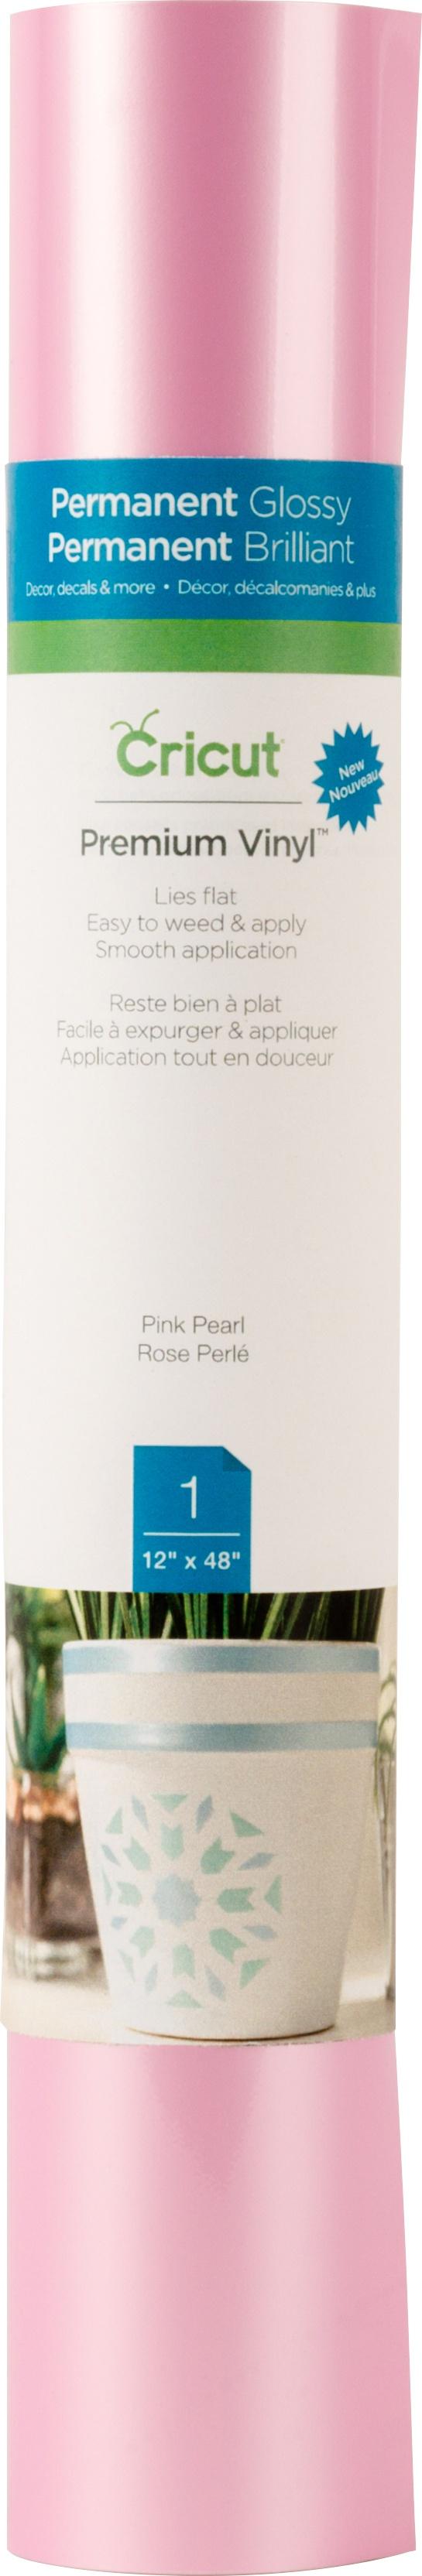 PINK PEARL-CRICUT VINYL 12X48